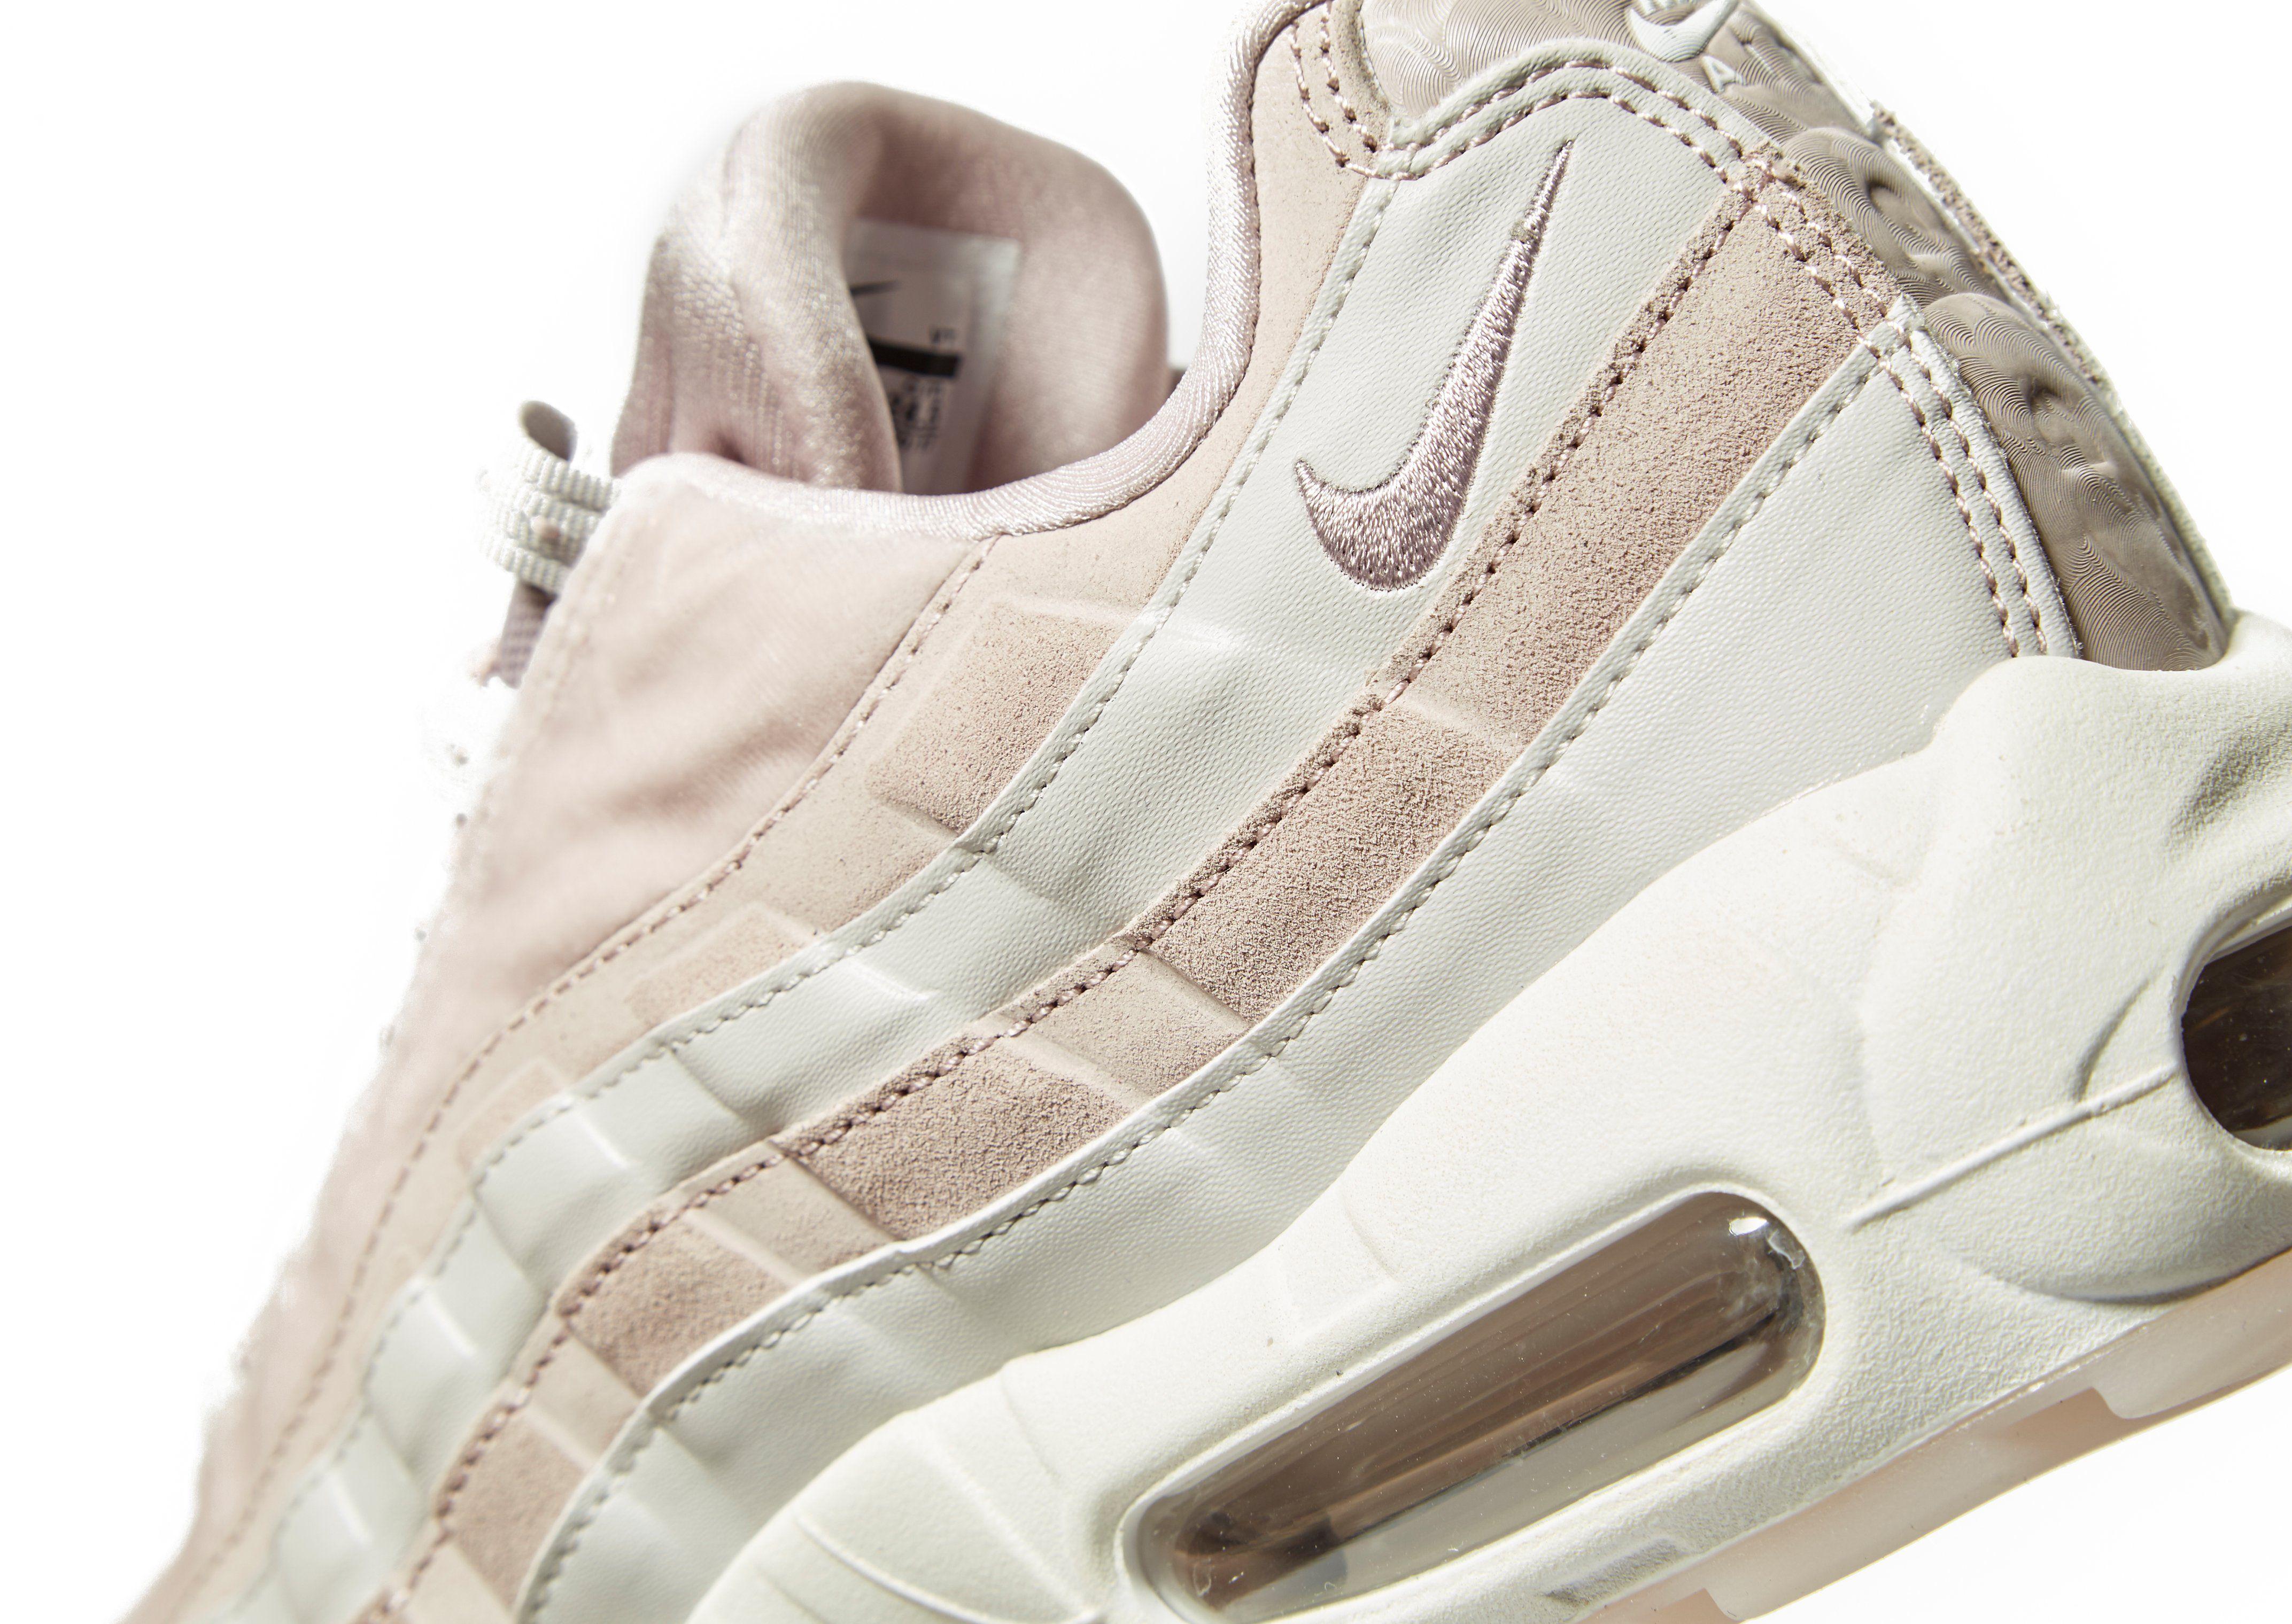 Nike Air Max 95 Damen Pink Shop-Angebot Günstiger Preis 9jhnJEmjLw